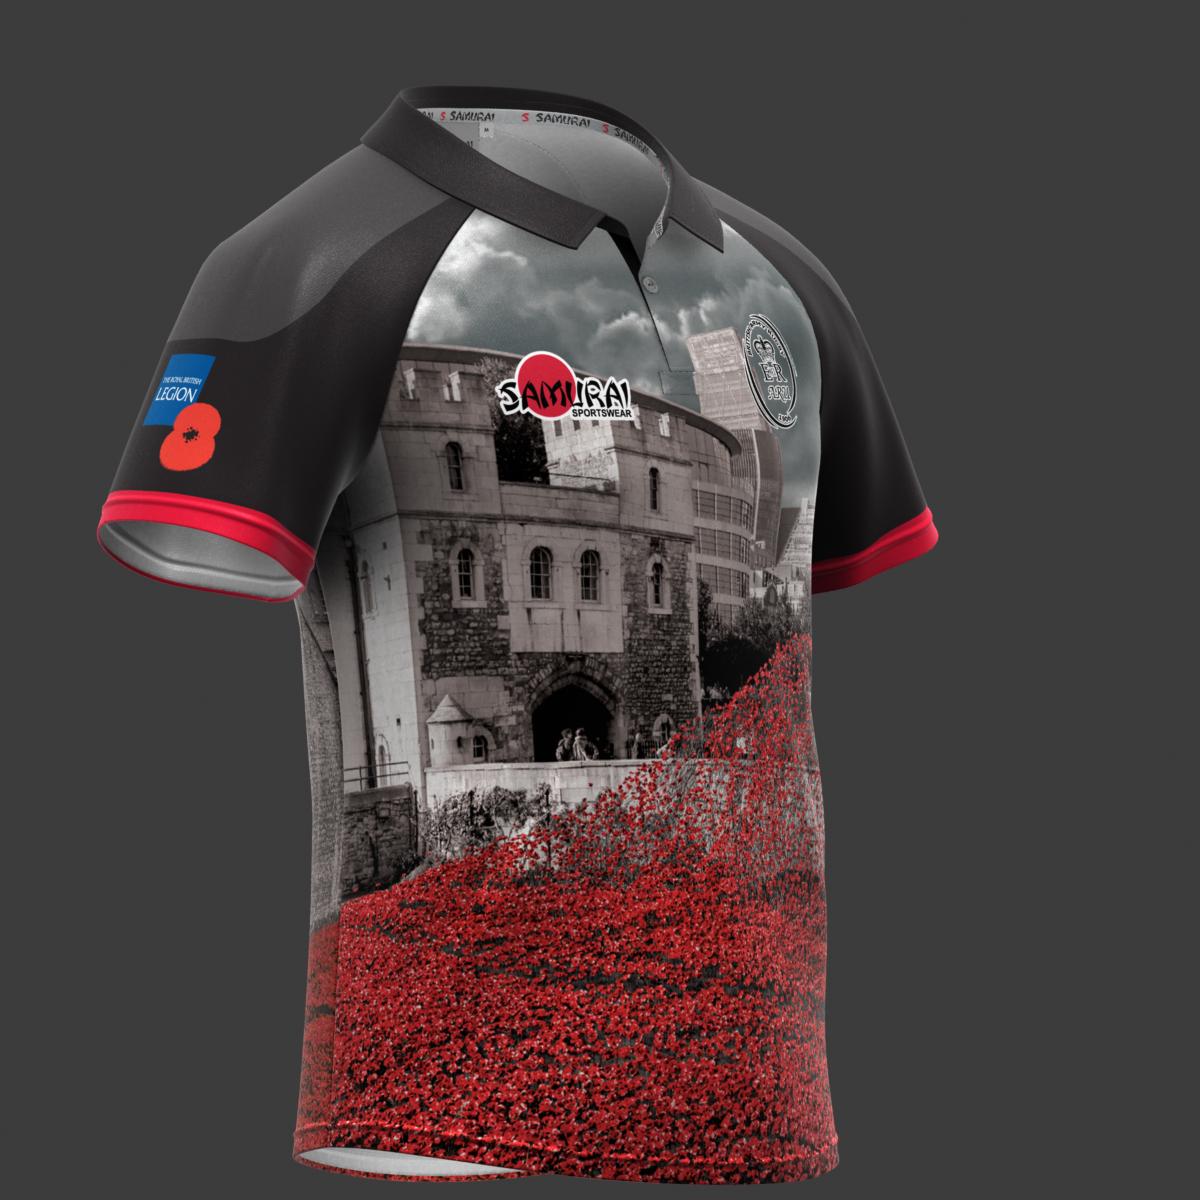 Very proud to launch our 6th annual #poppyshirt @samurai_sports 'In Flanders Fields' https://t.co/mlj4HXkPB1 https://t.co/Na72pmVrwo